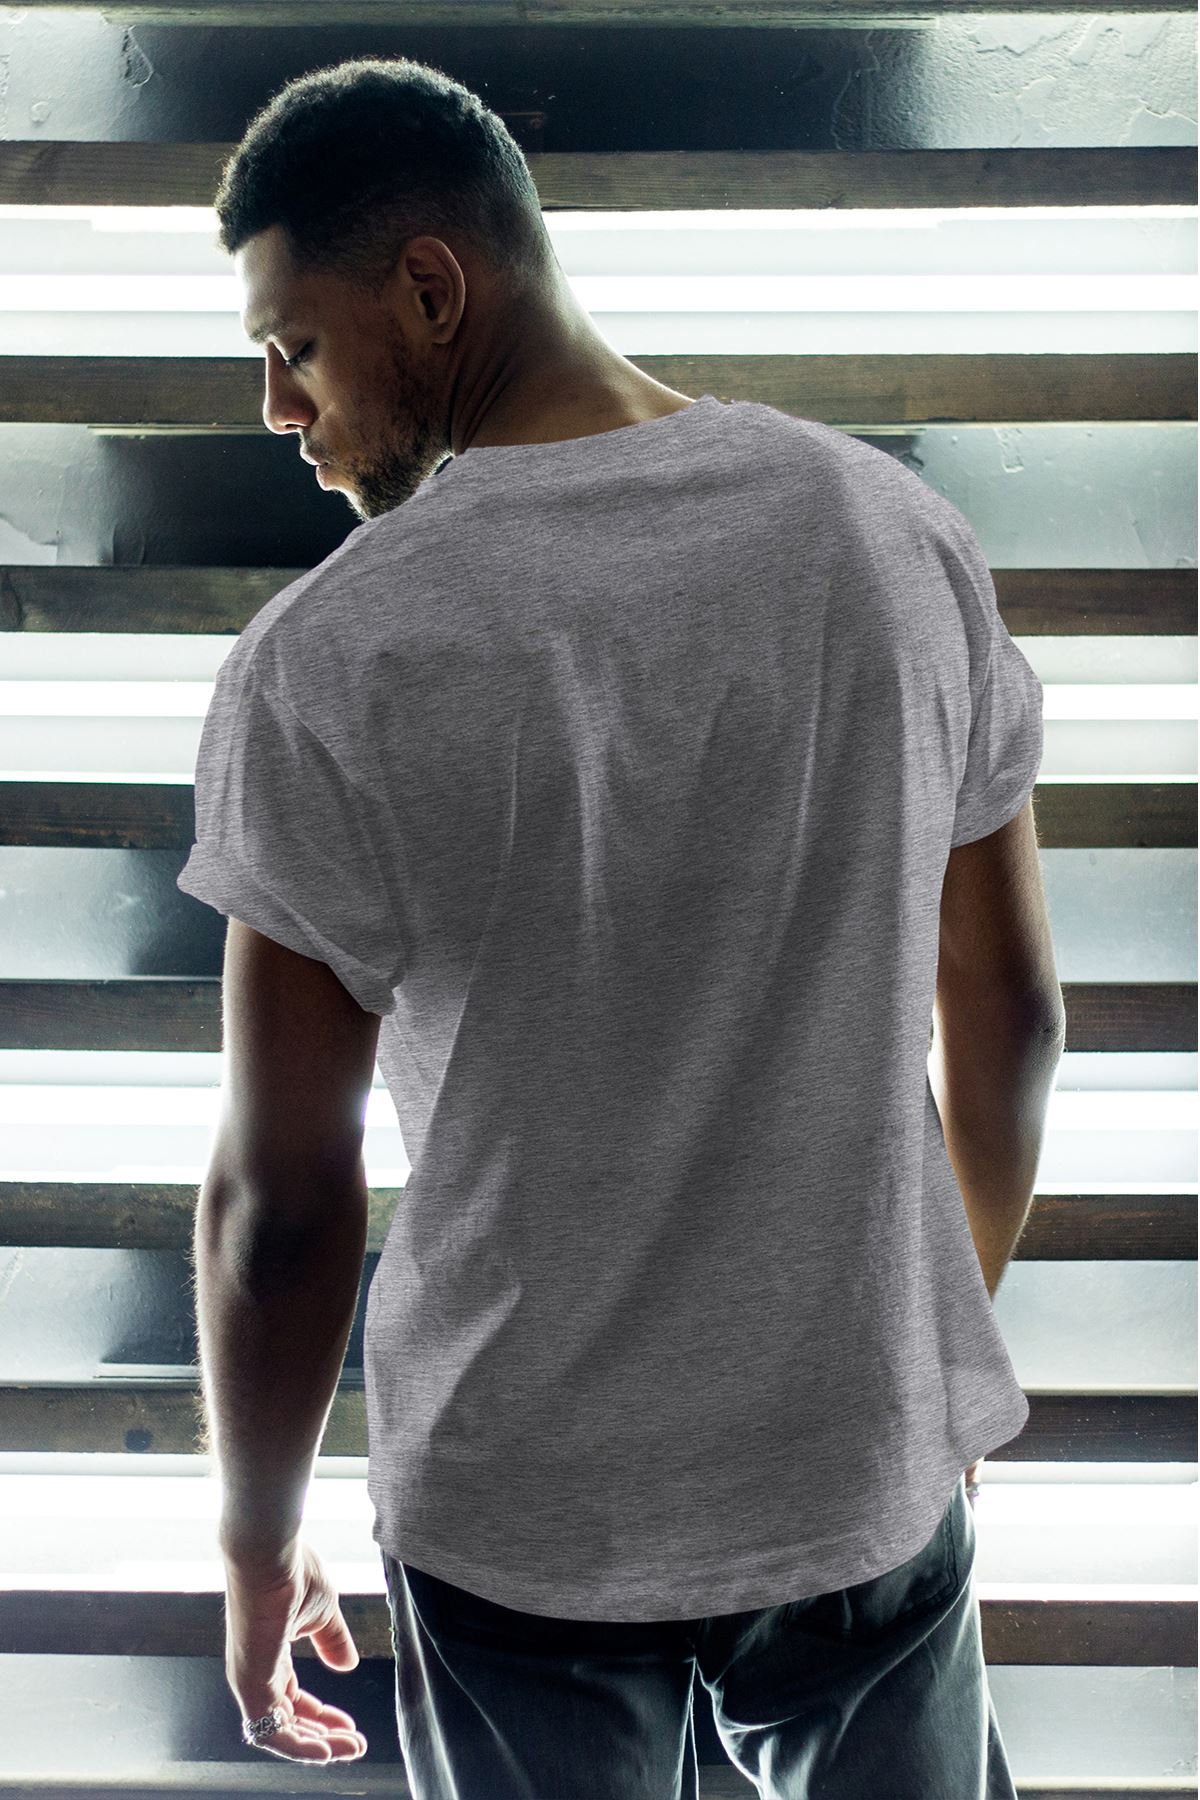 Boston Celtics 30 Gri Erkek Oversize Tshirt - Tişört